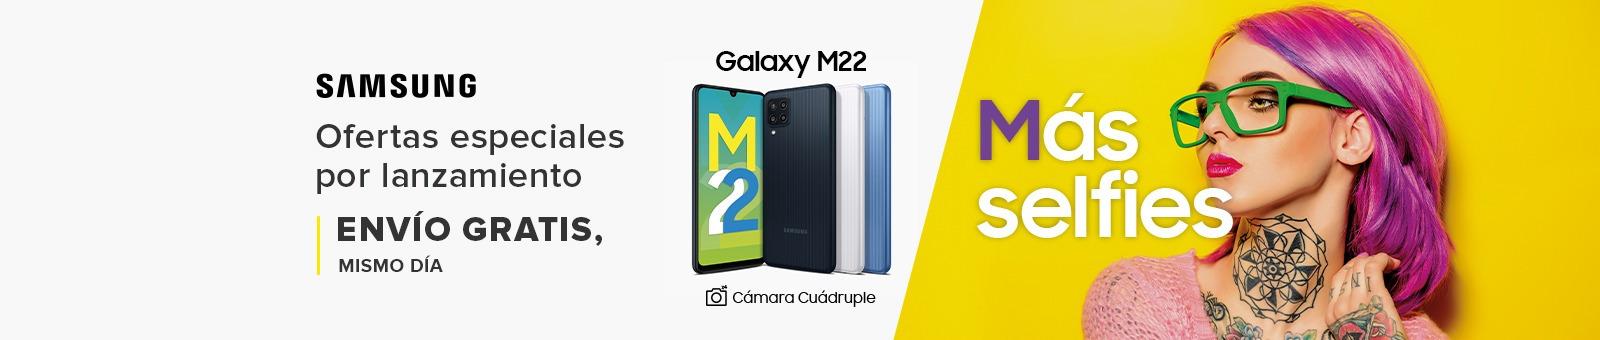 MS_Samsung_Octubre_2021_MLM_W_1